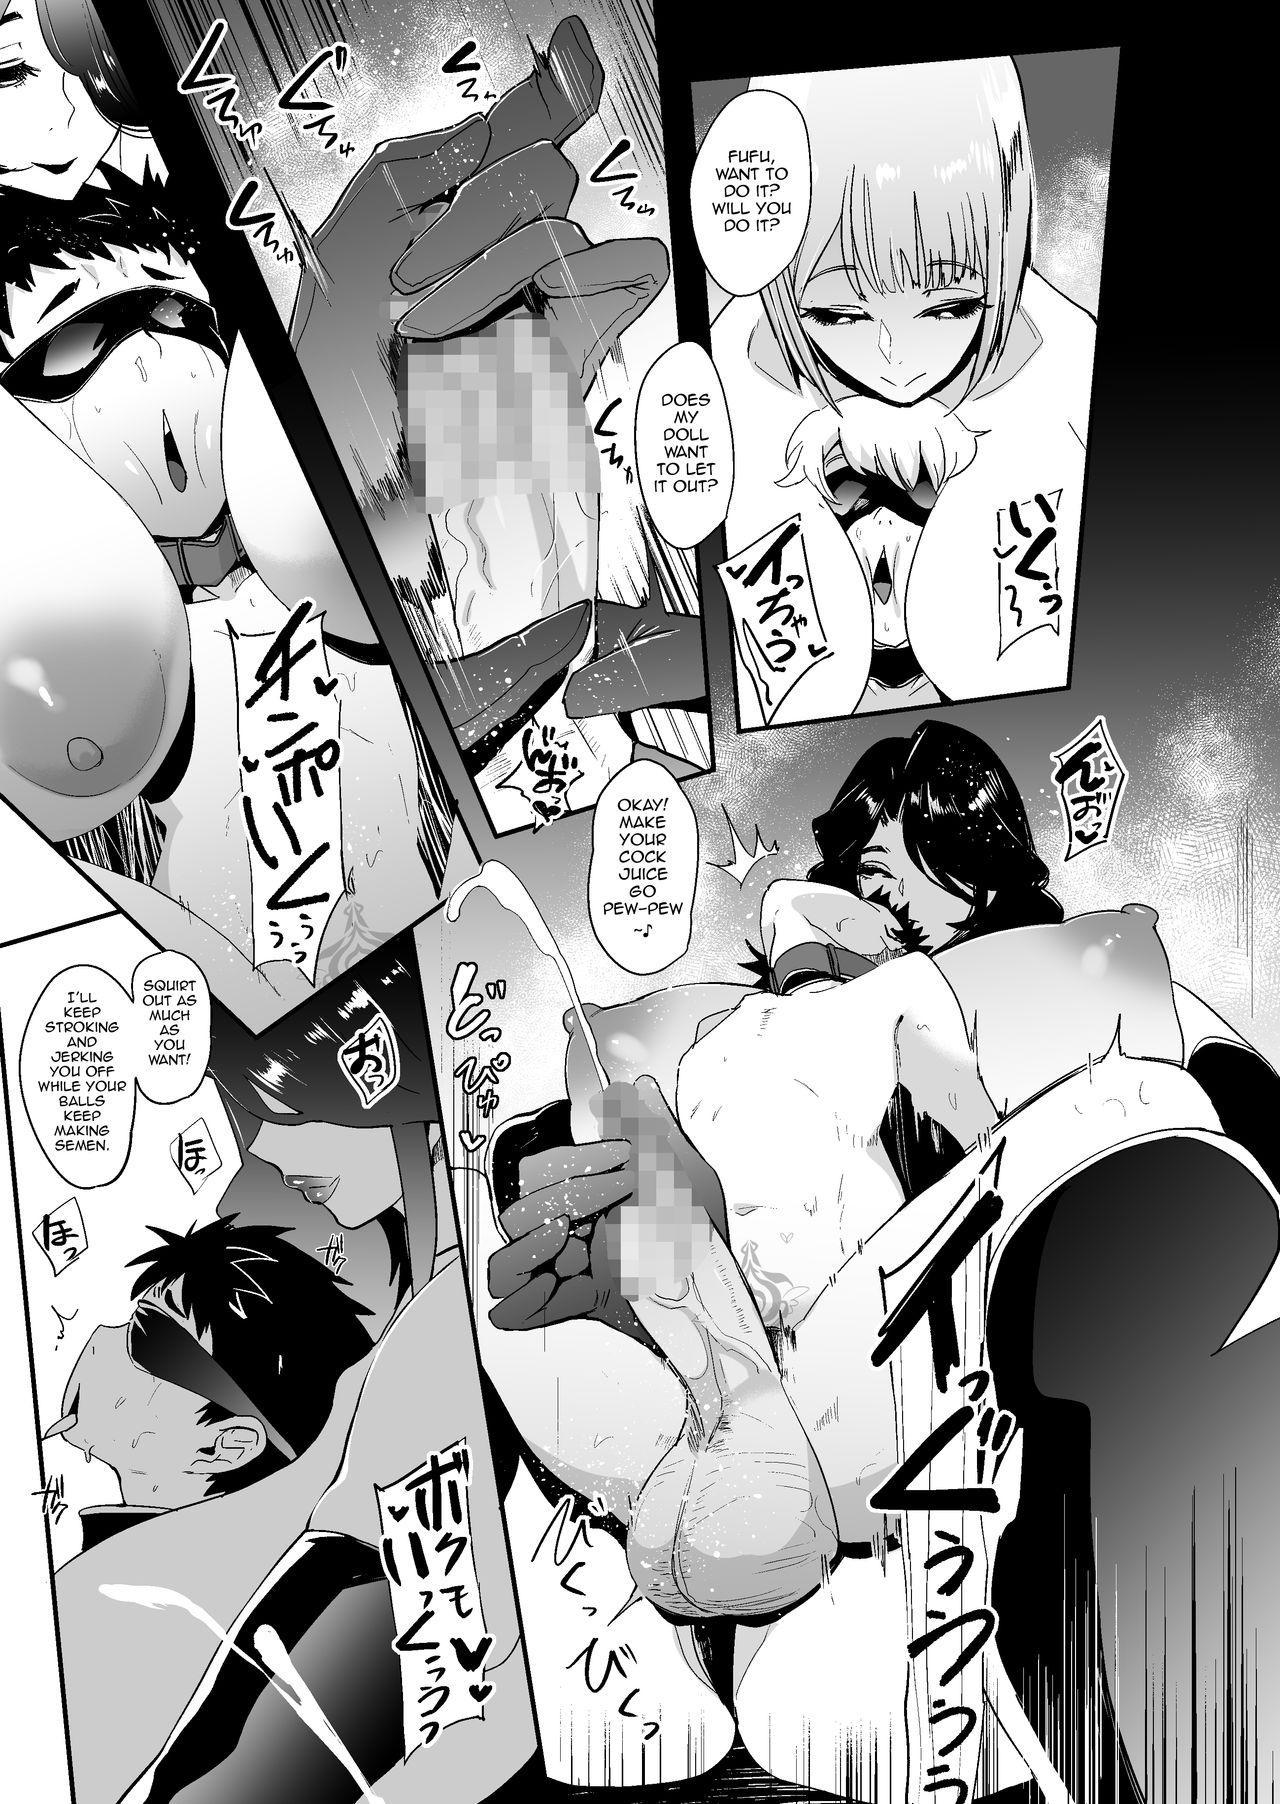 [SOUND MILK (Otochichi)] Mori no Majo - Kyousei Jinkaku Haishutsu Shasei - | Forest Witches - Forced Personality Ejection Ejaculation - [English] [Jormangander] 23